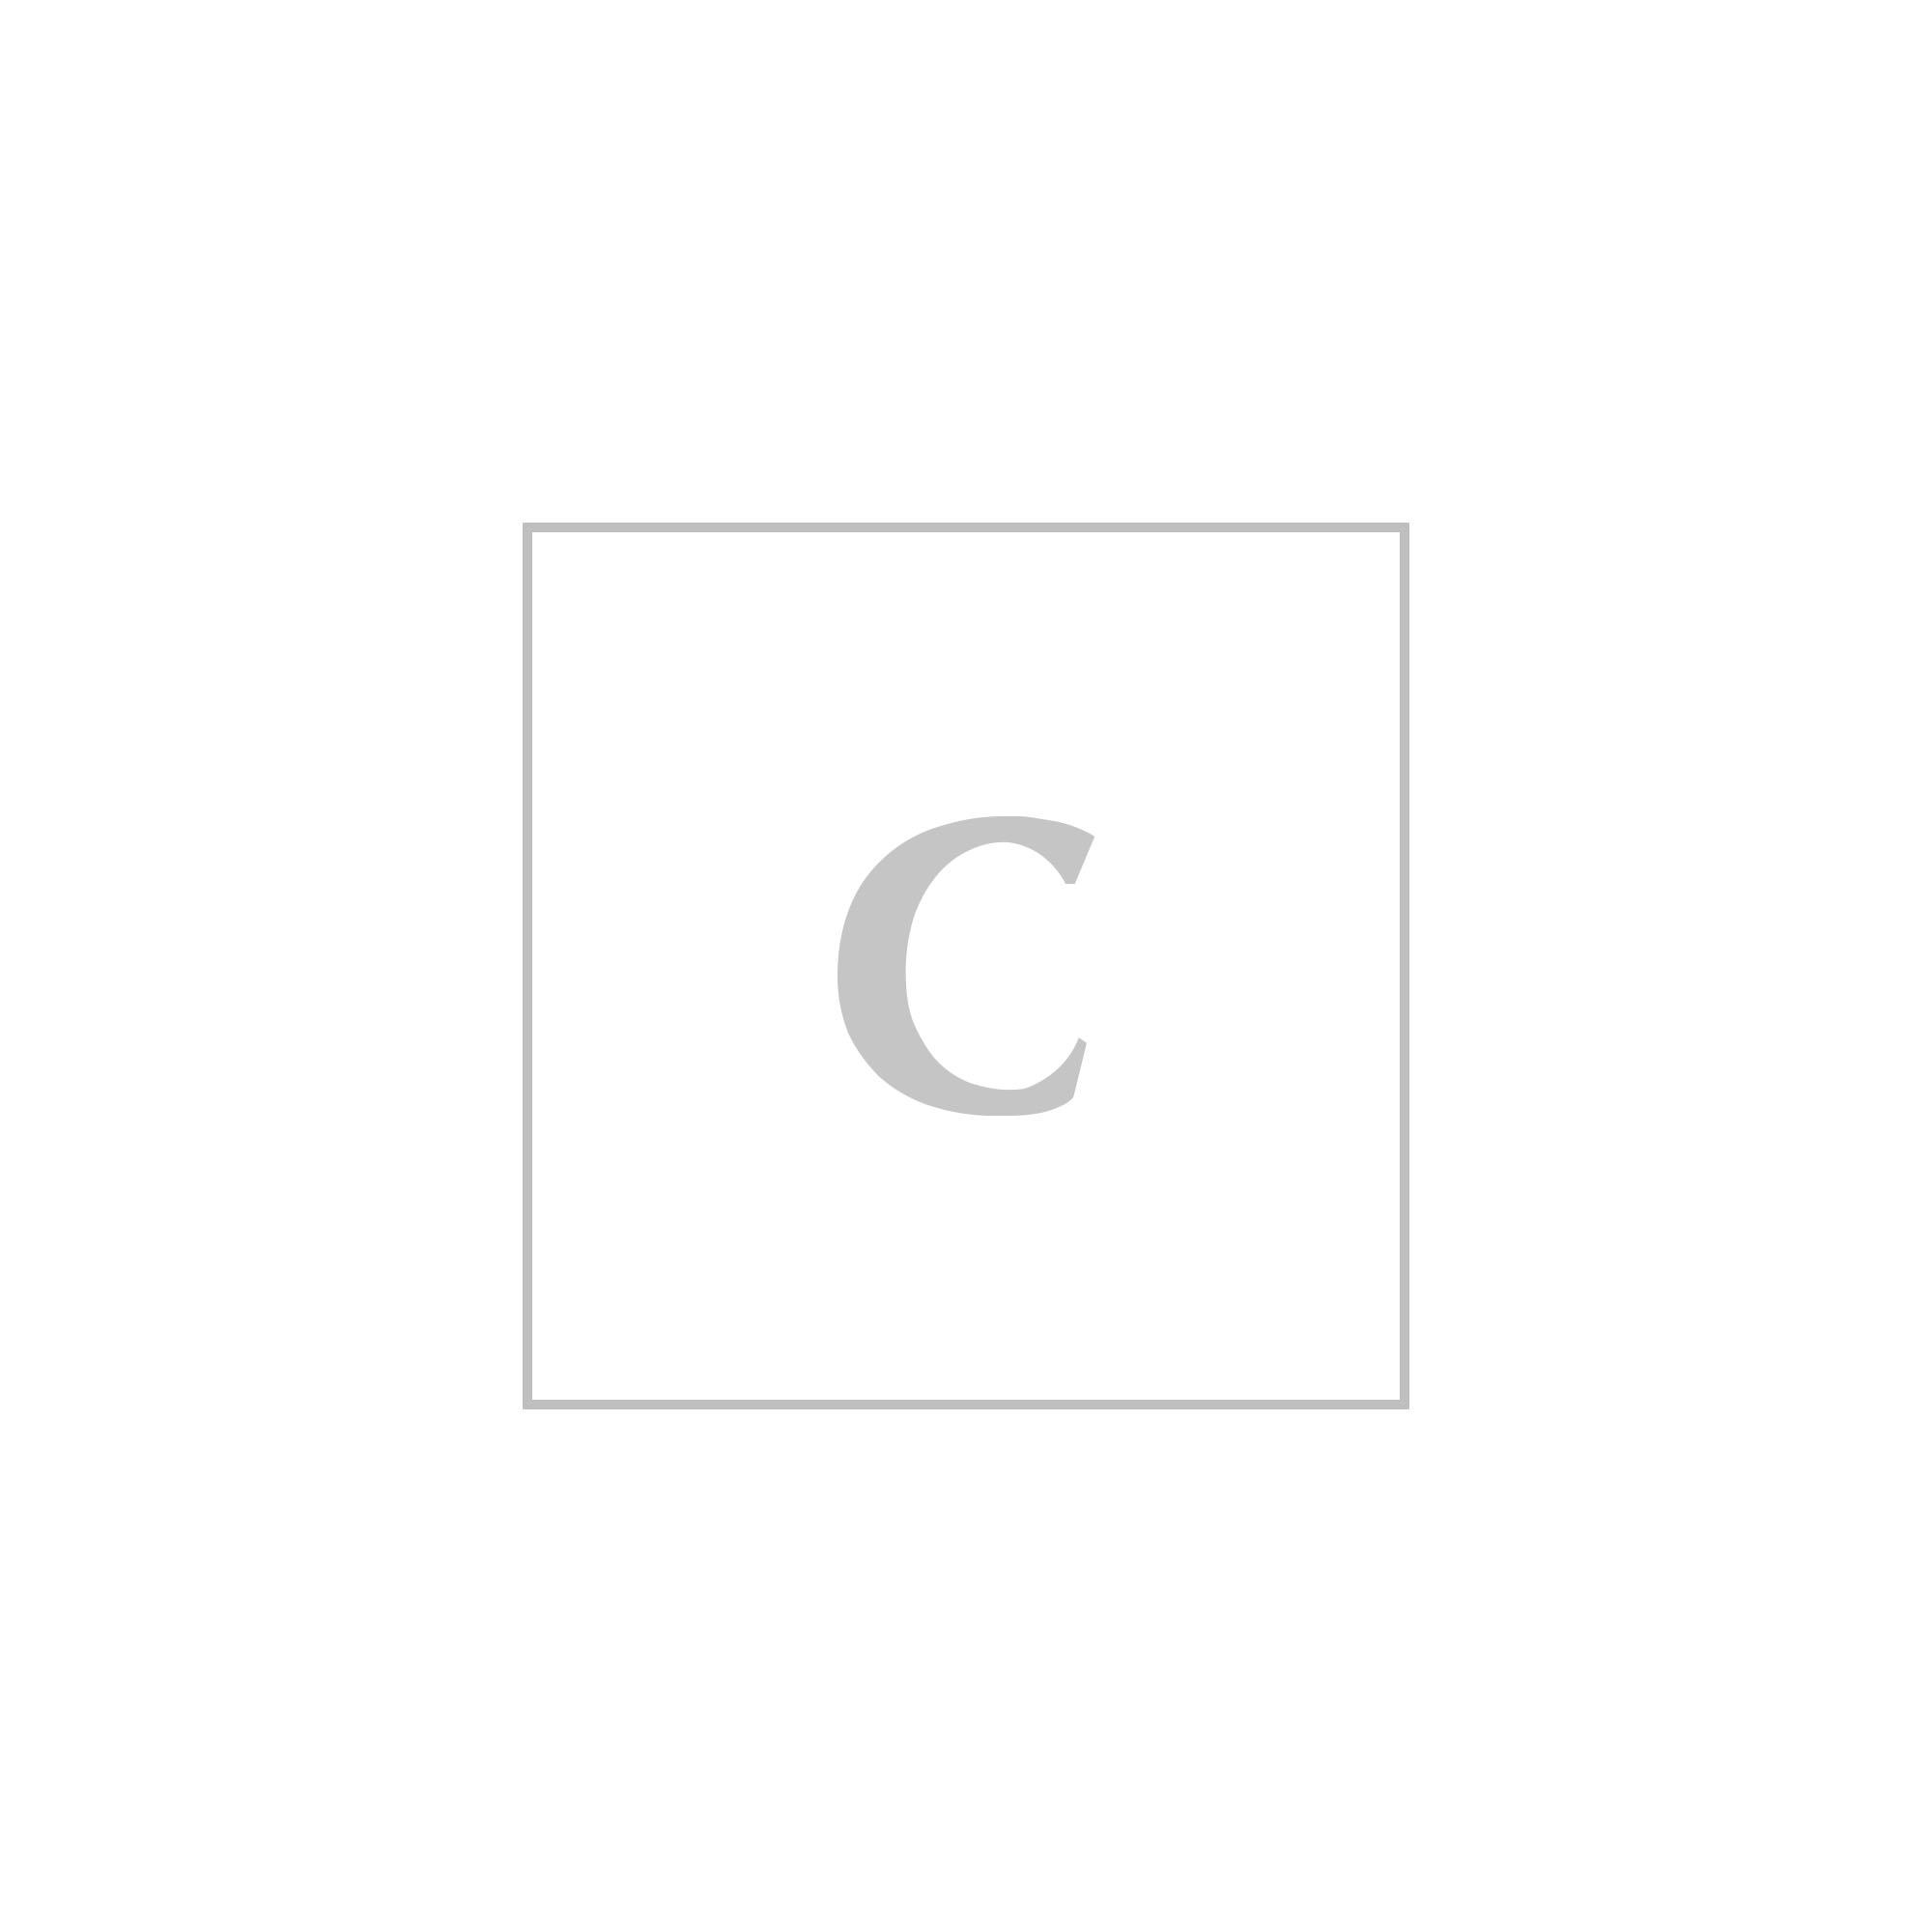 Kenzo k logo cardholder